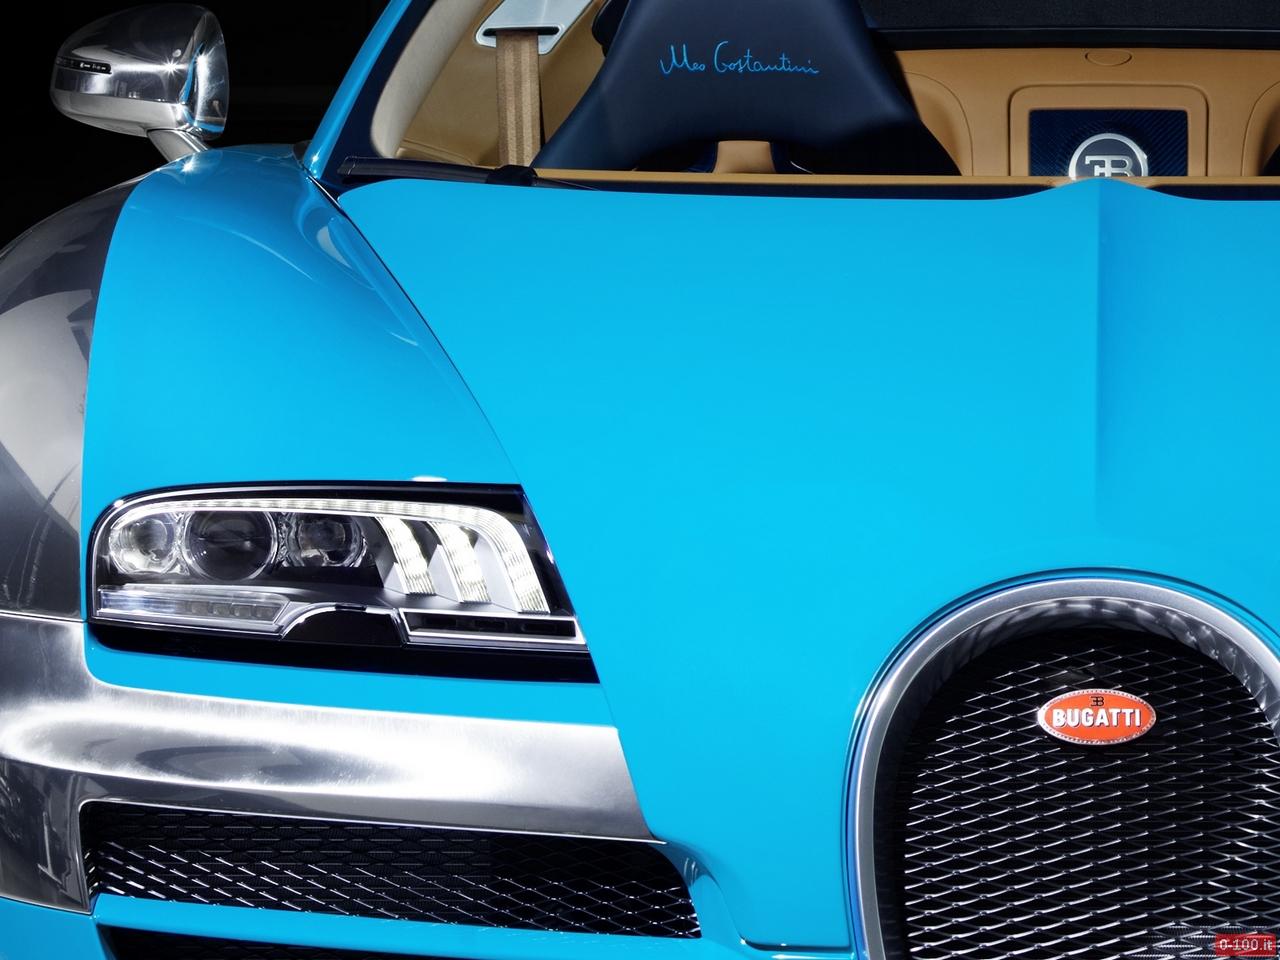 bugatti-veyron-grand-sport-vitesse-meo-costantini_0-100_13